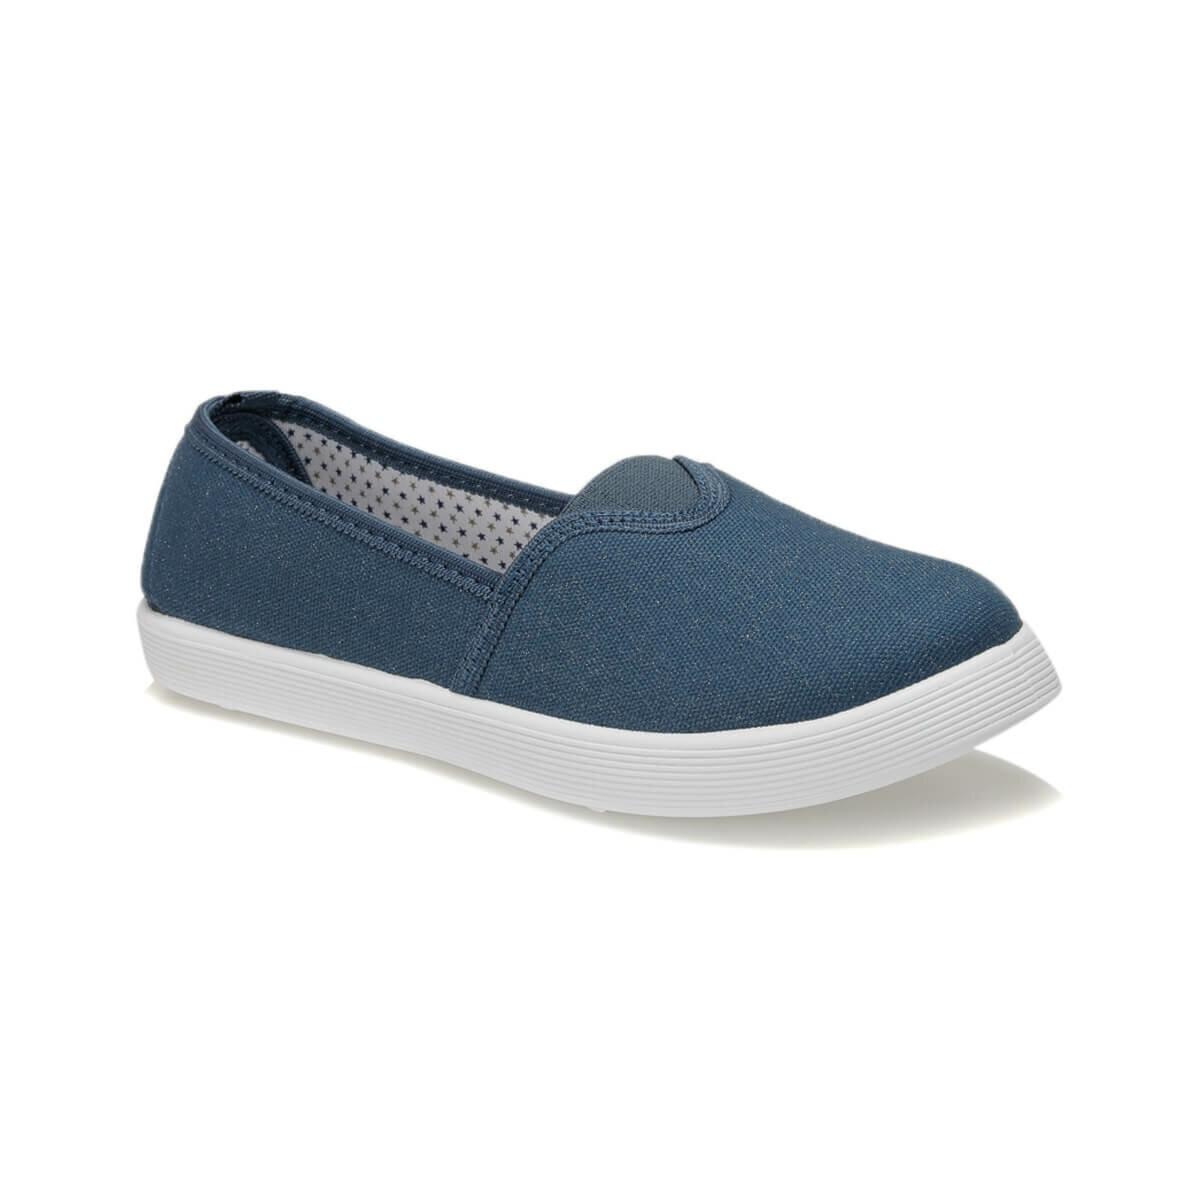 FLO 91. 311594.Z Light Blue Women 'S Slip On Shoes Polaris